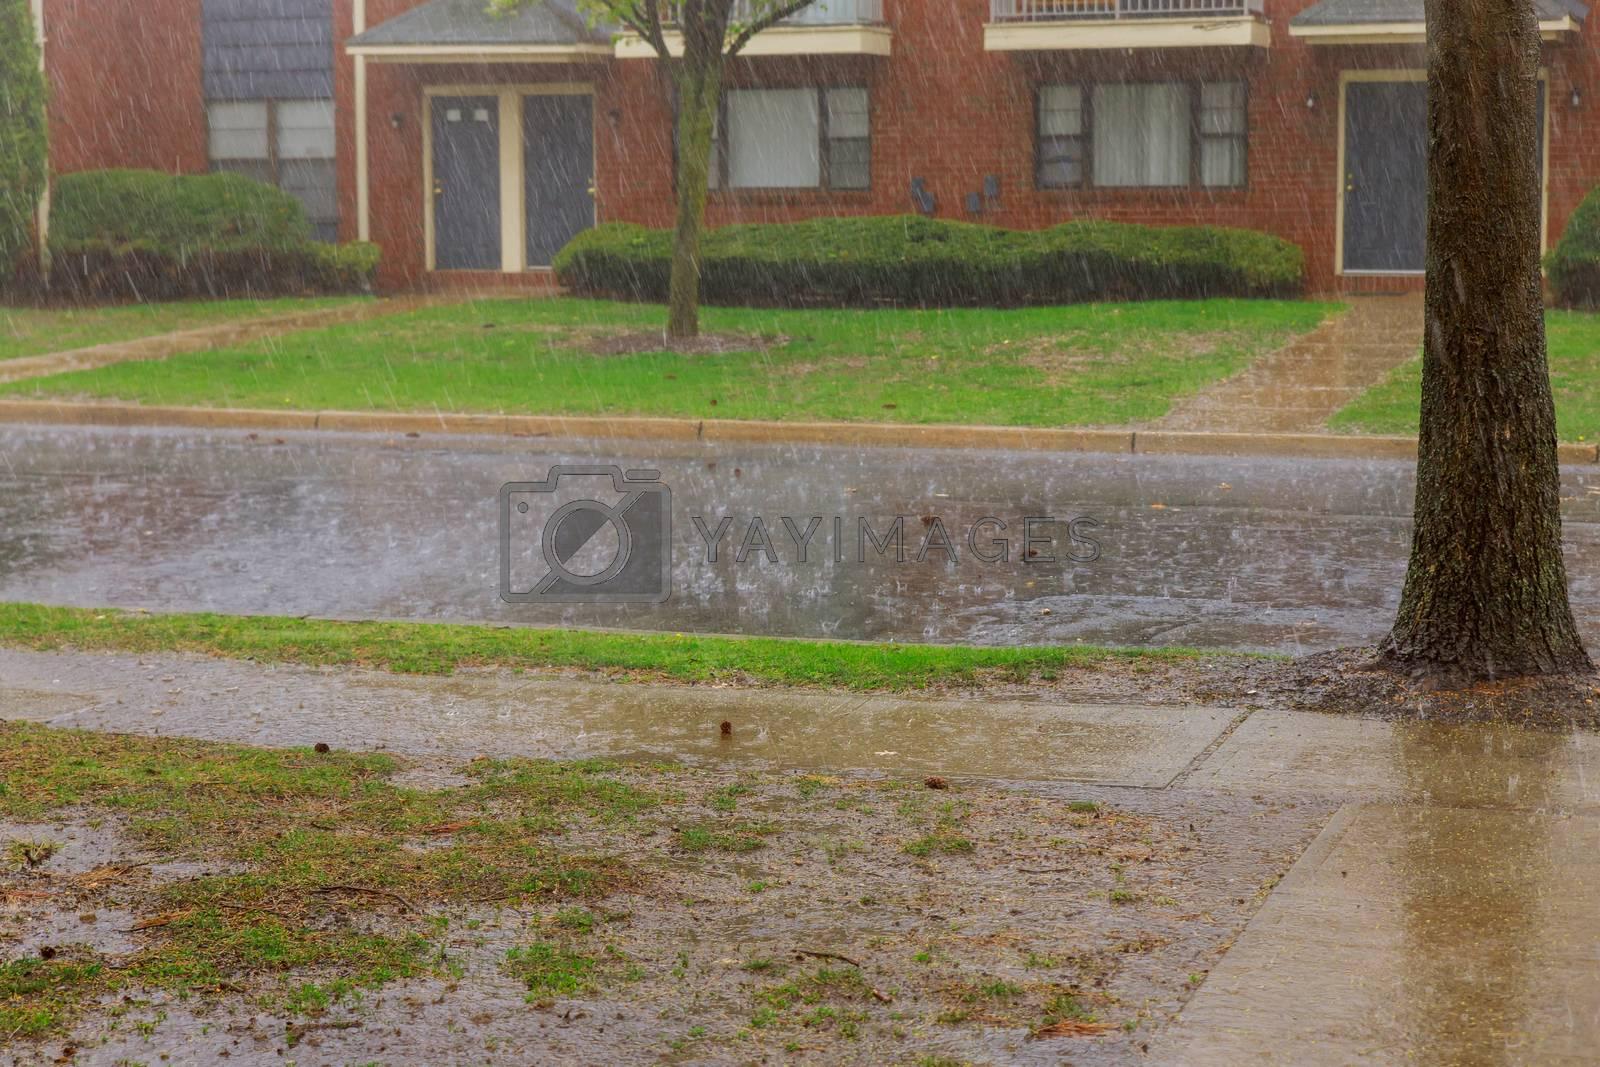 Rainy season on apartment building during strong winds heavy rain drops falling on asphalt